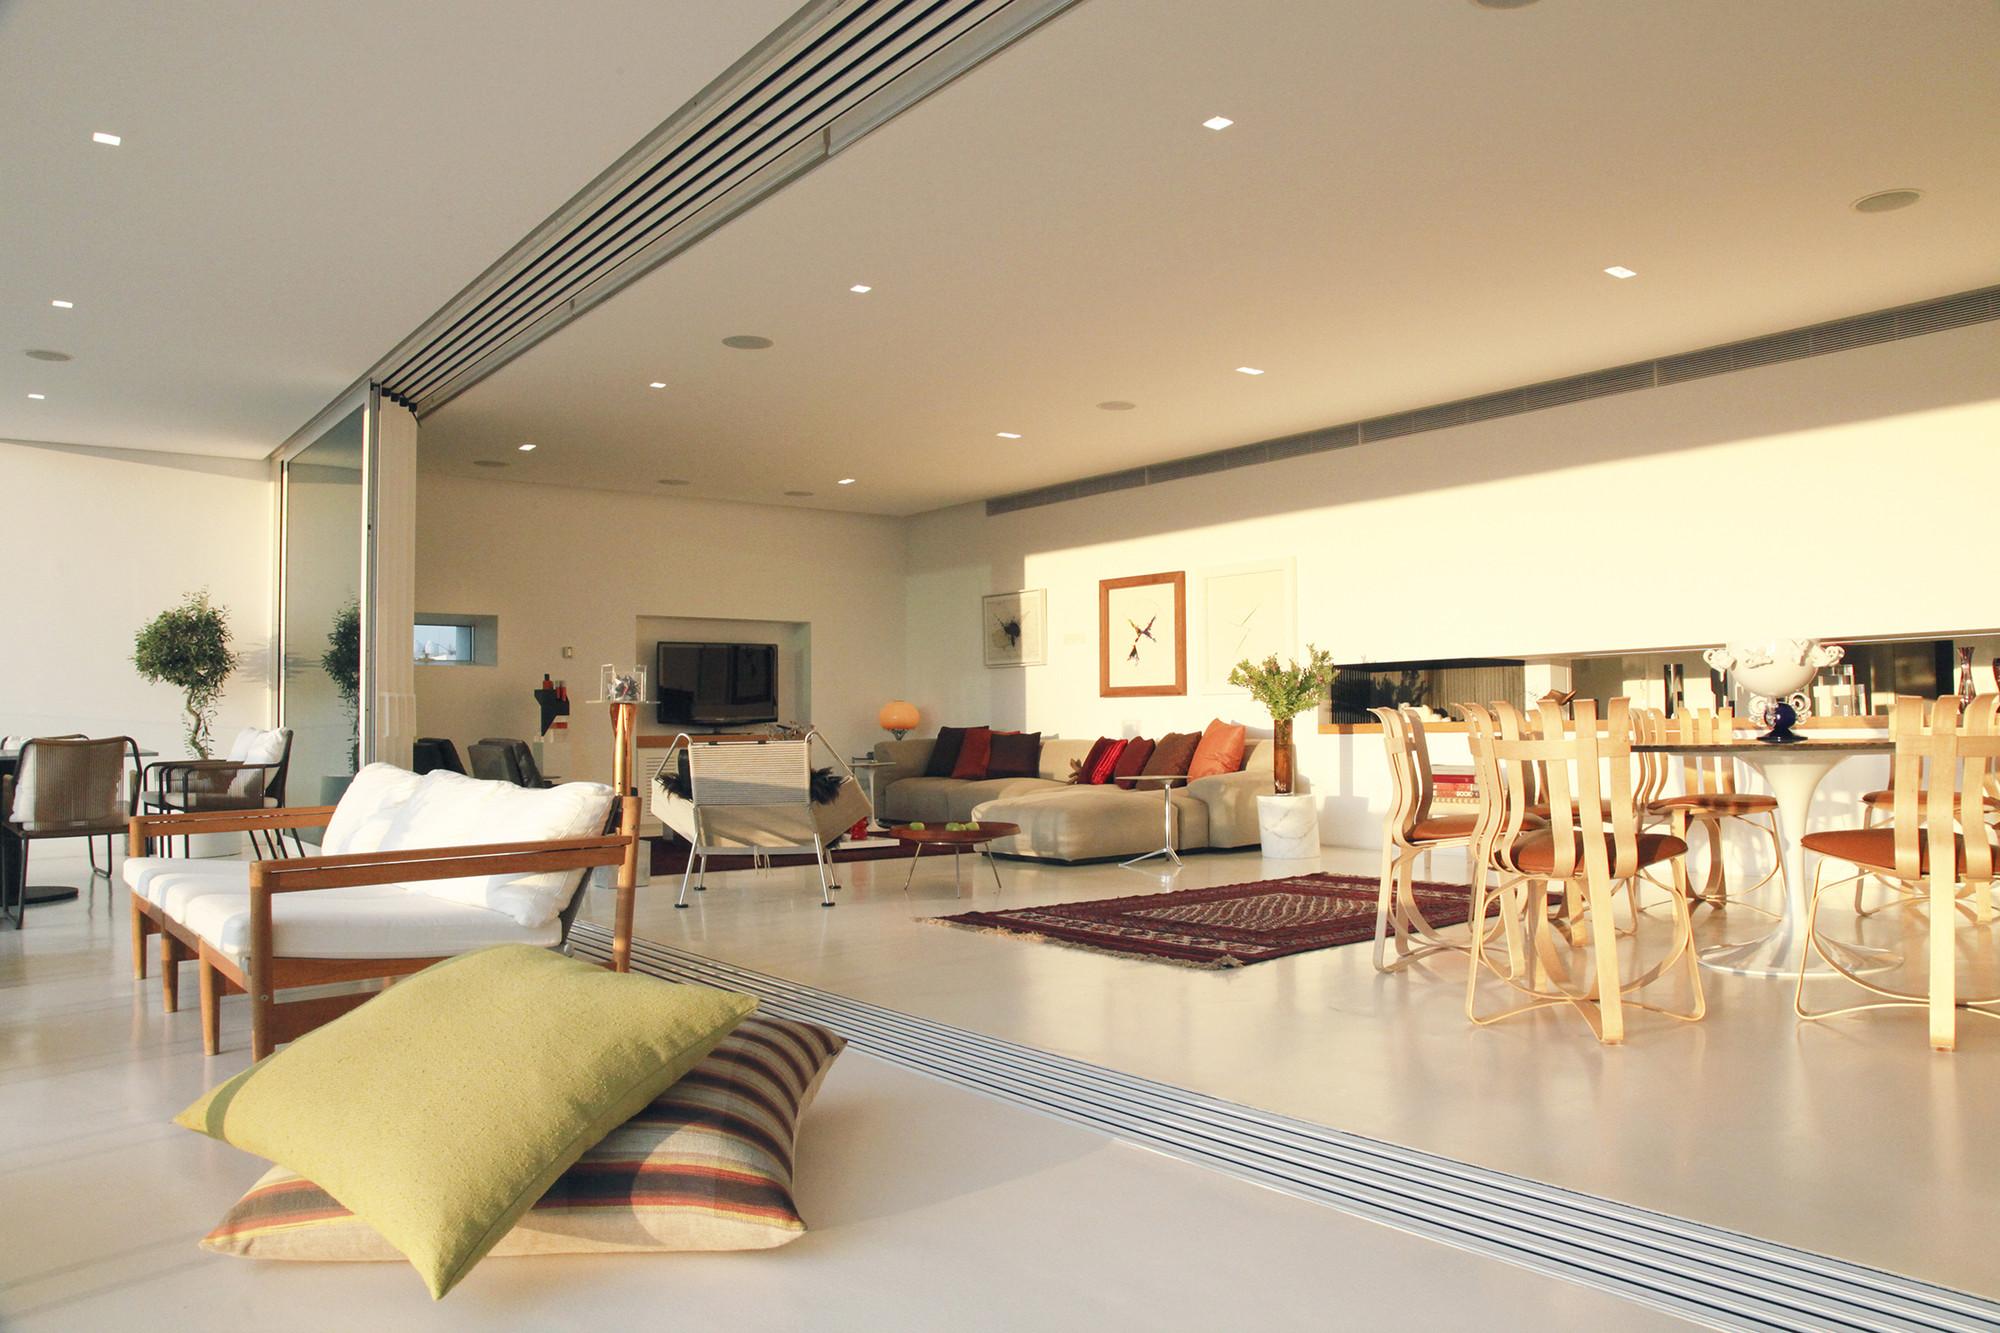 Proton / Constantinos Kalisperas Architectural Studio